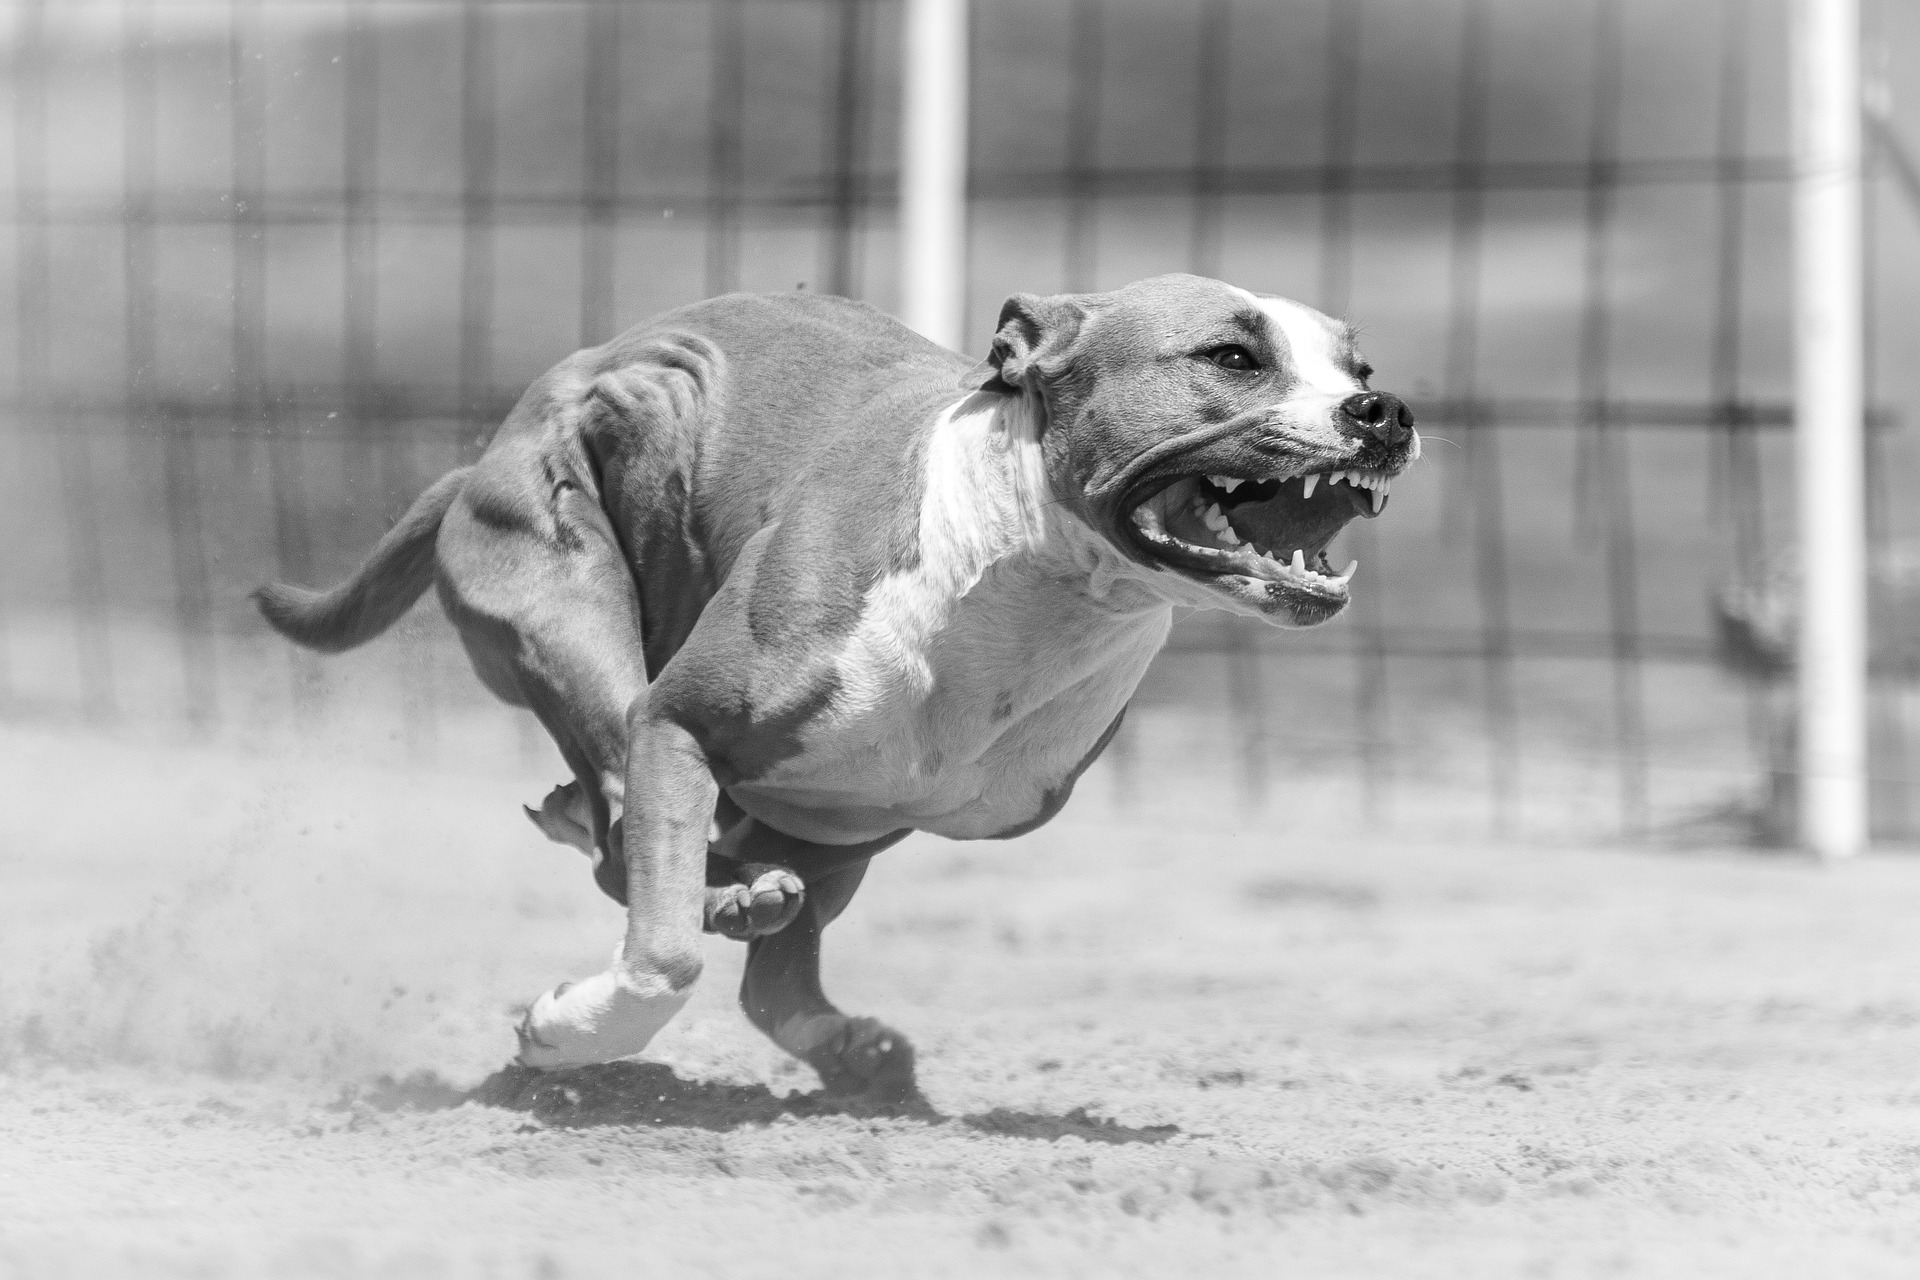 angry dog, aggressive canine